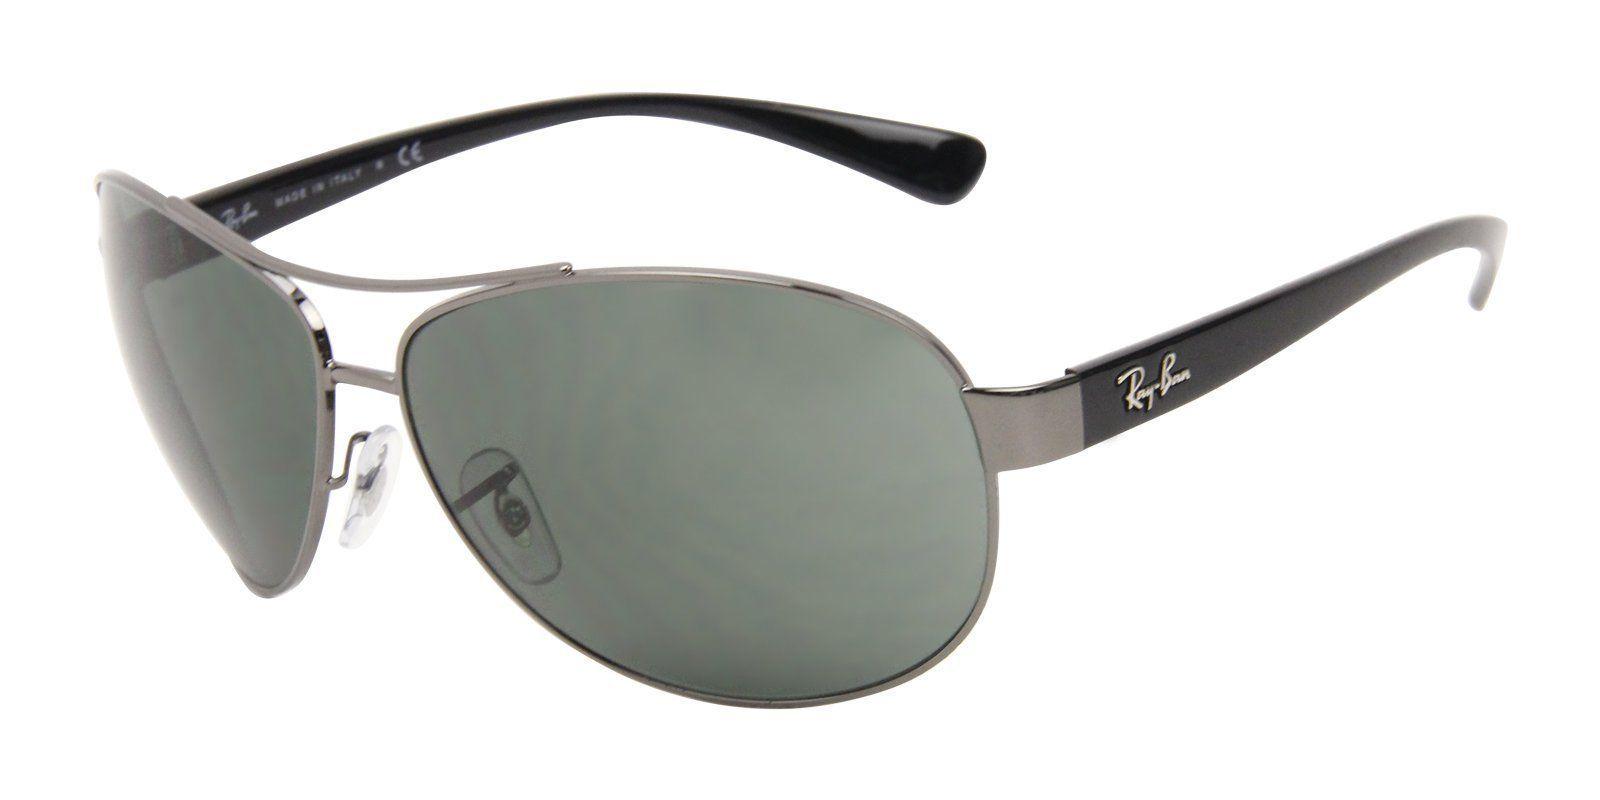 cd57448f63 Ray Ban - RB3386 Gray - Green-sunglasses-Designer Eyes